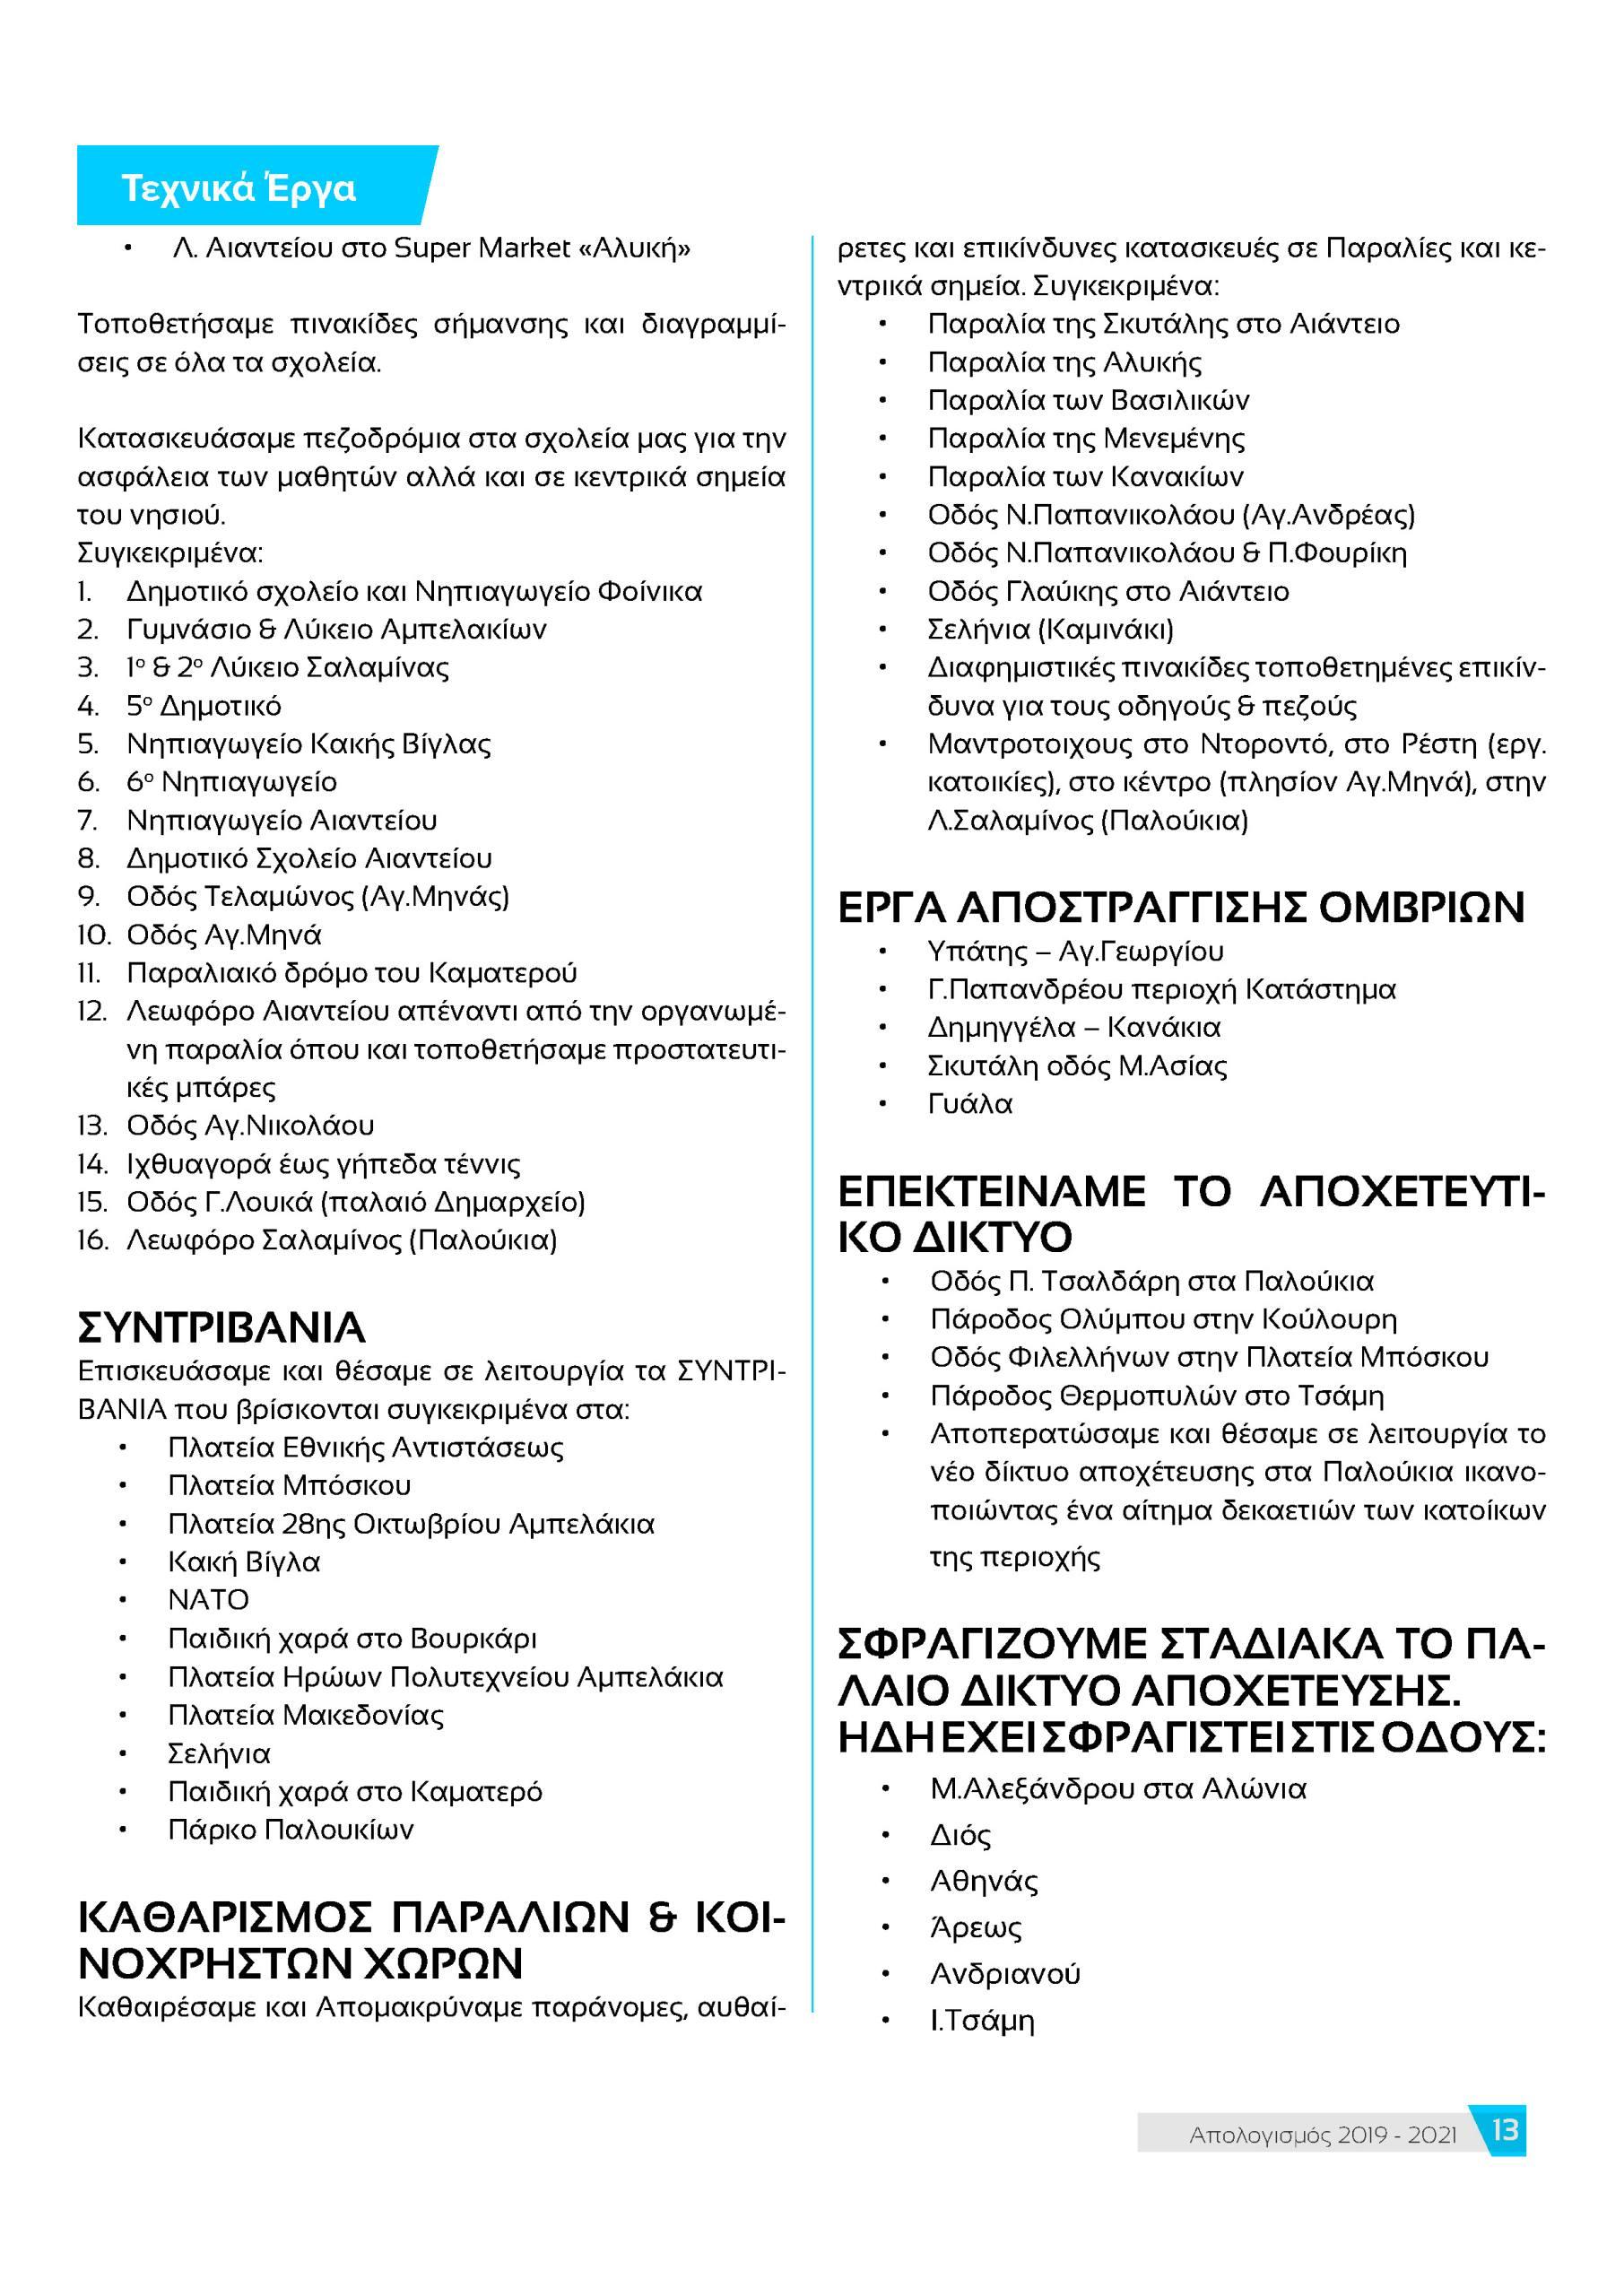 Brochure_Page_13